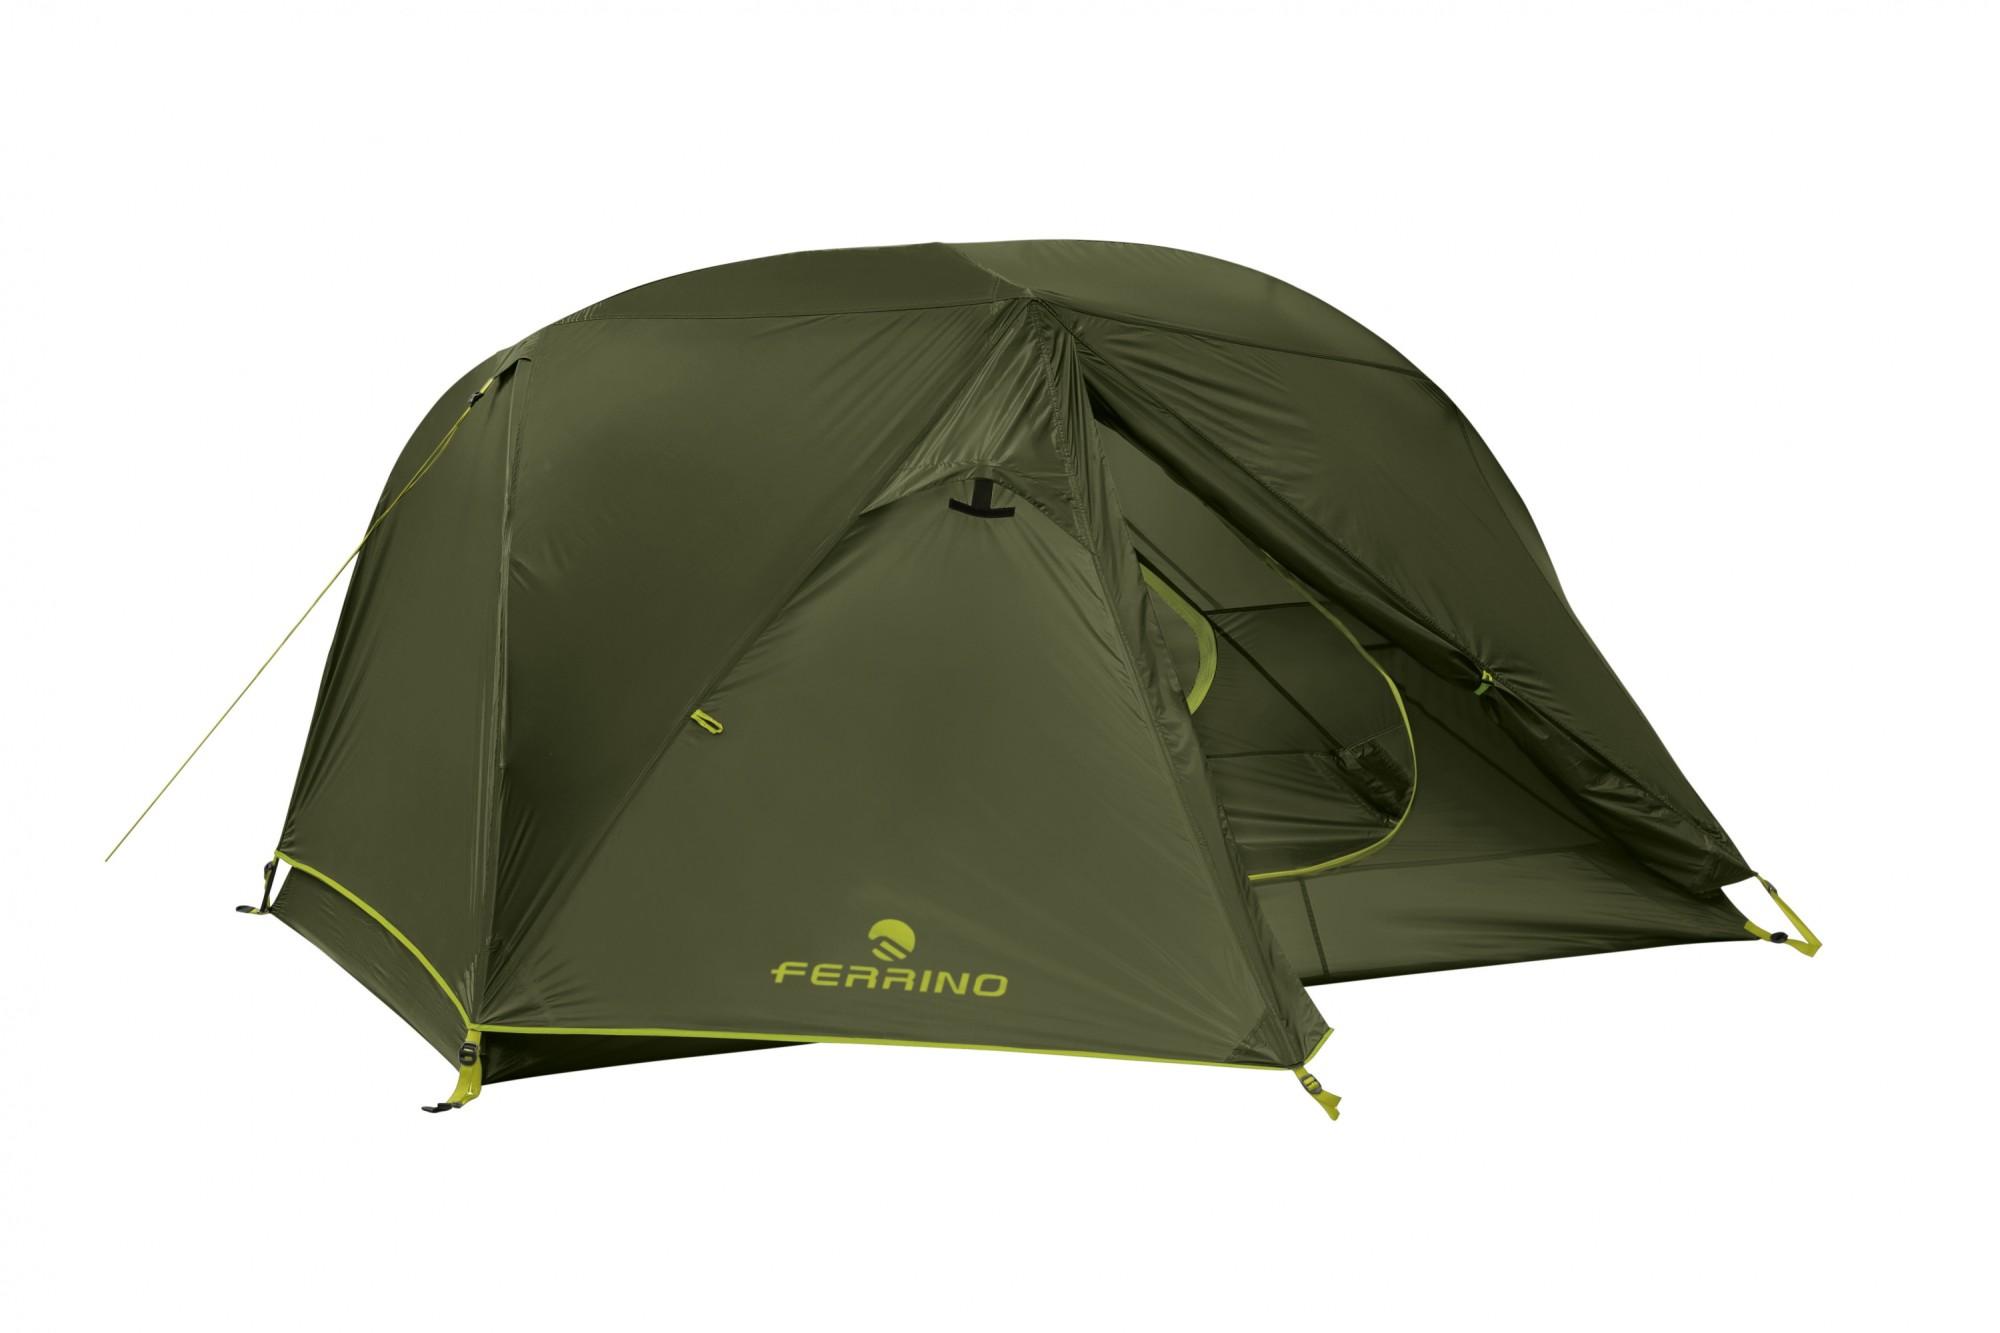 Ferrino - Atrax 2 - Tent